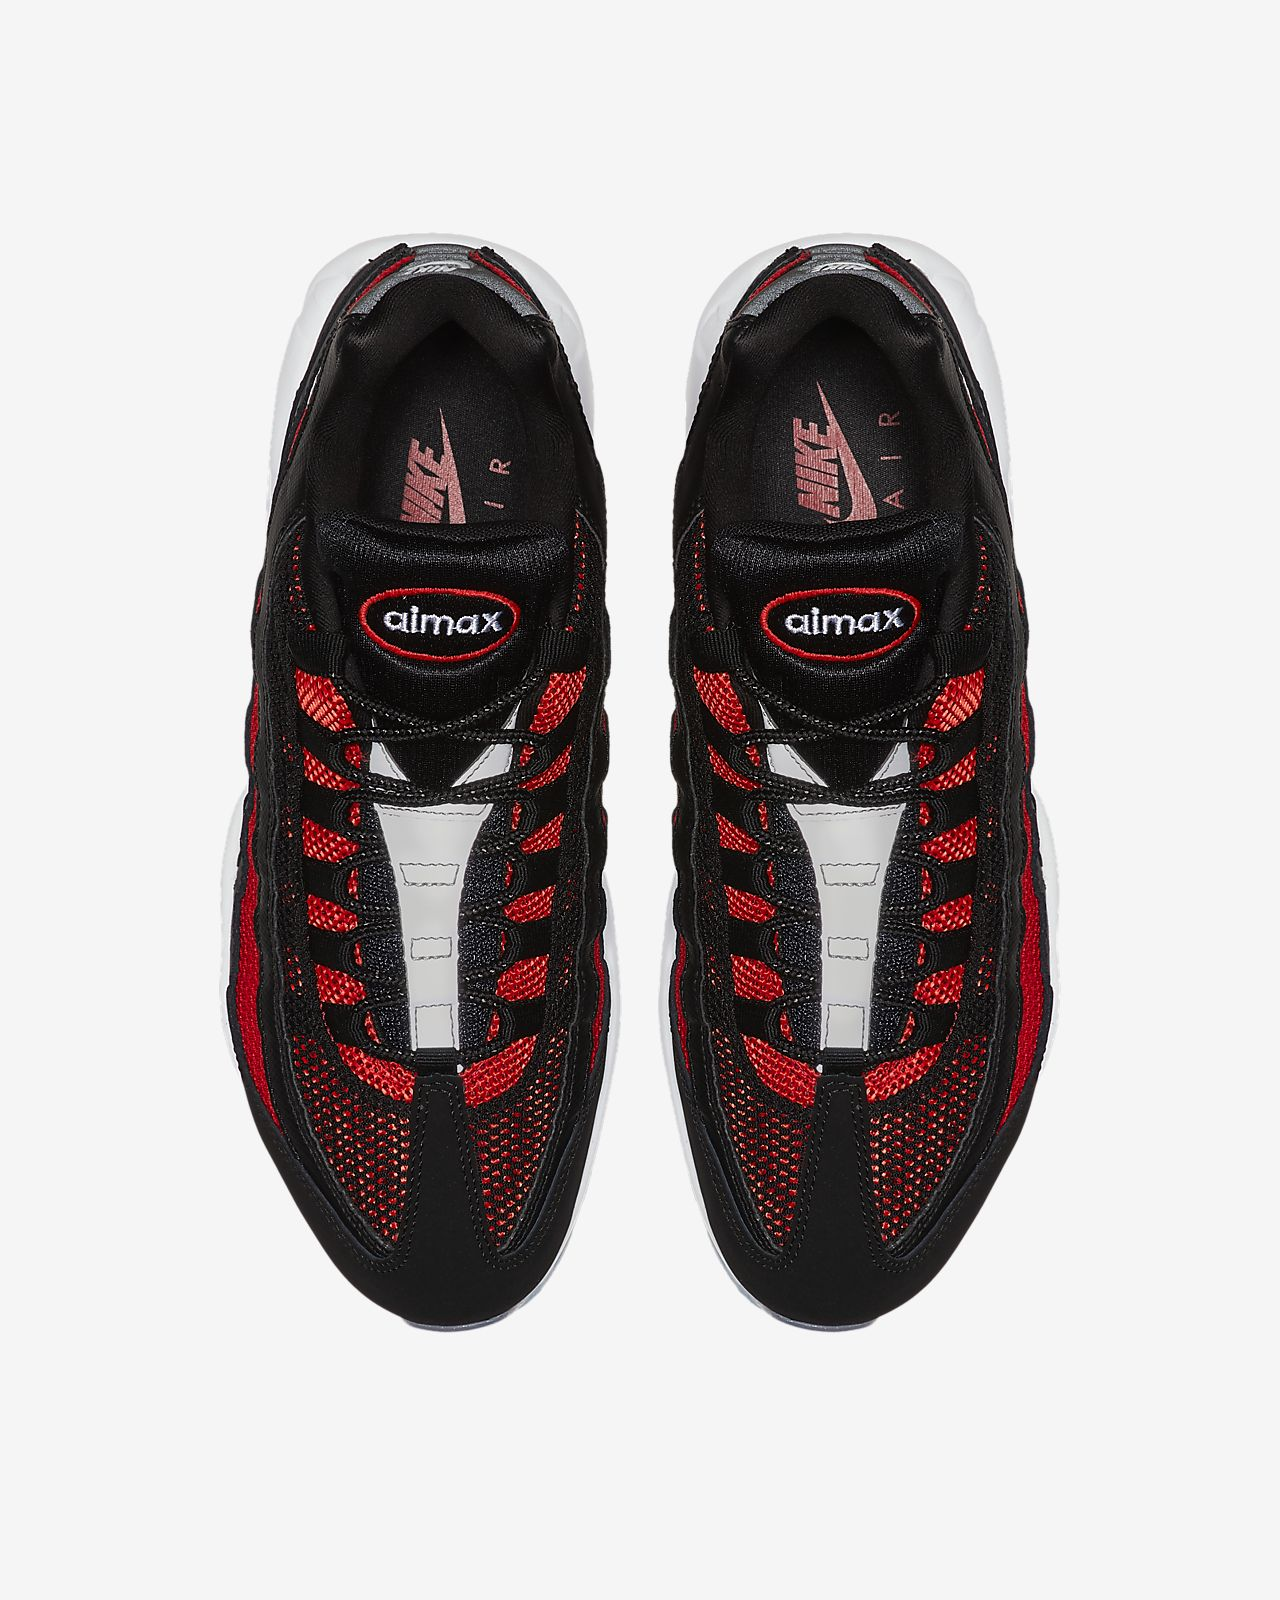 a519f26a45b7f Nike Air Max 95 Essential Men's Shoe. Nike.com GB